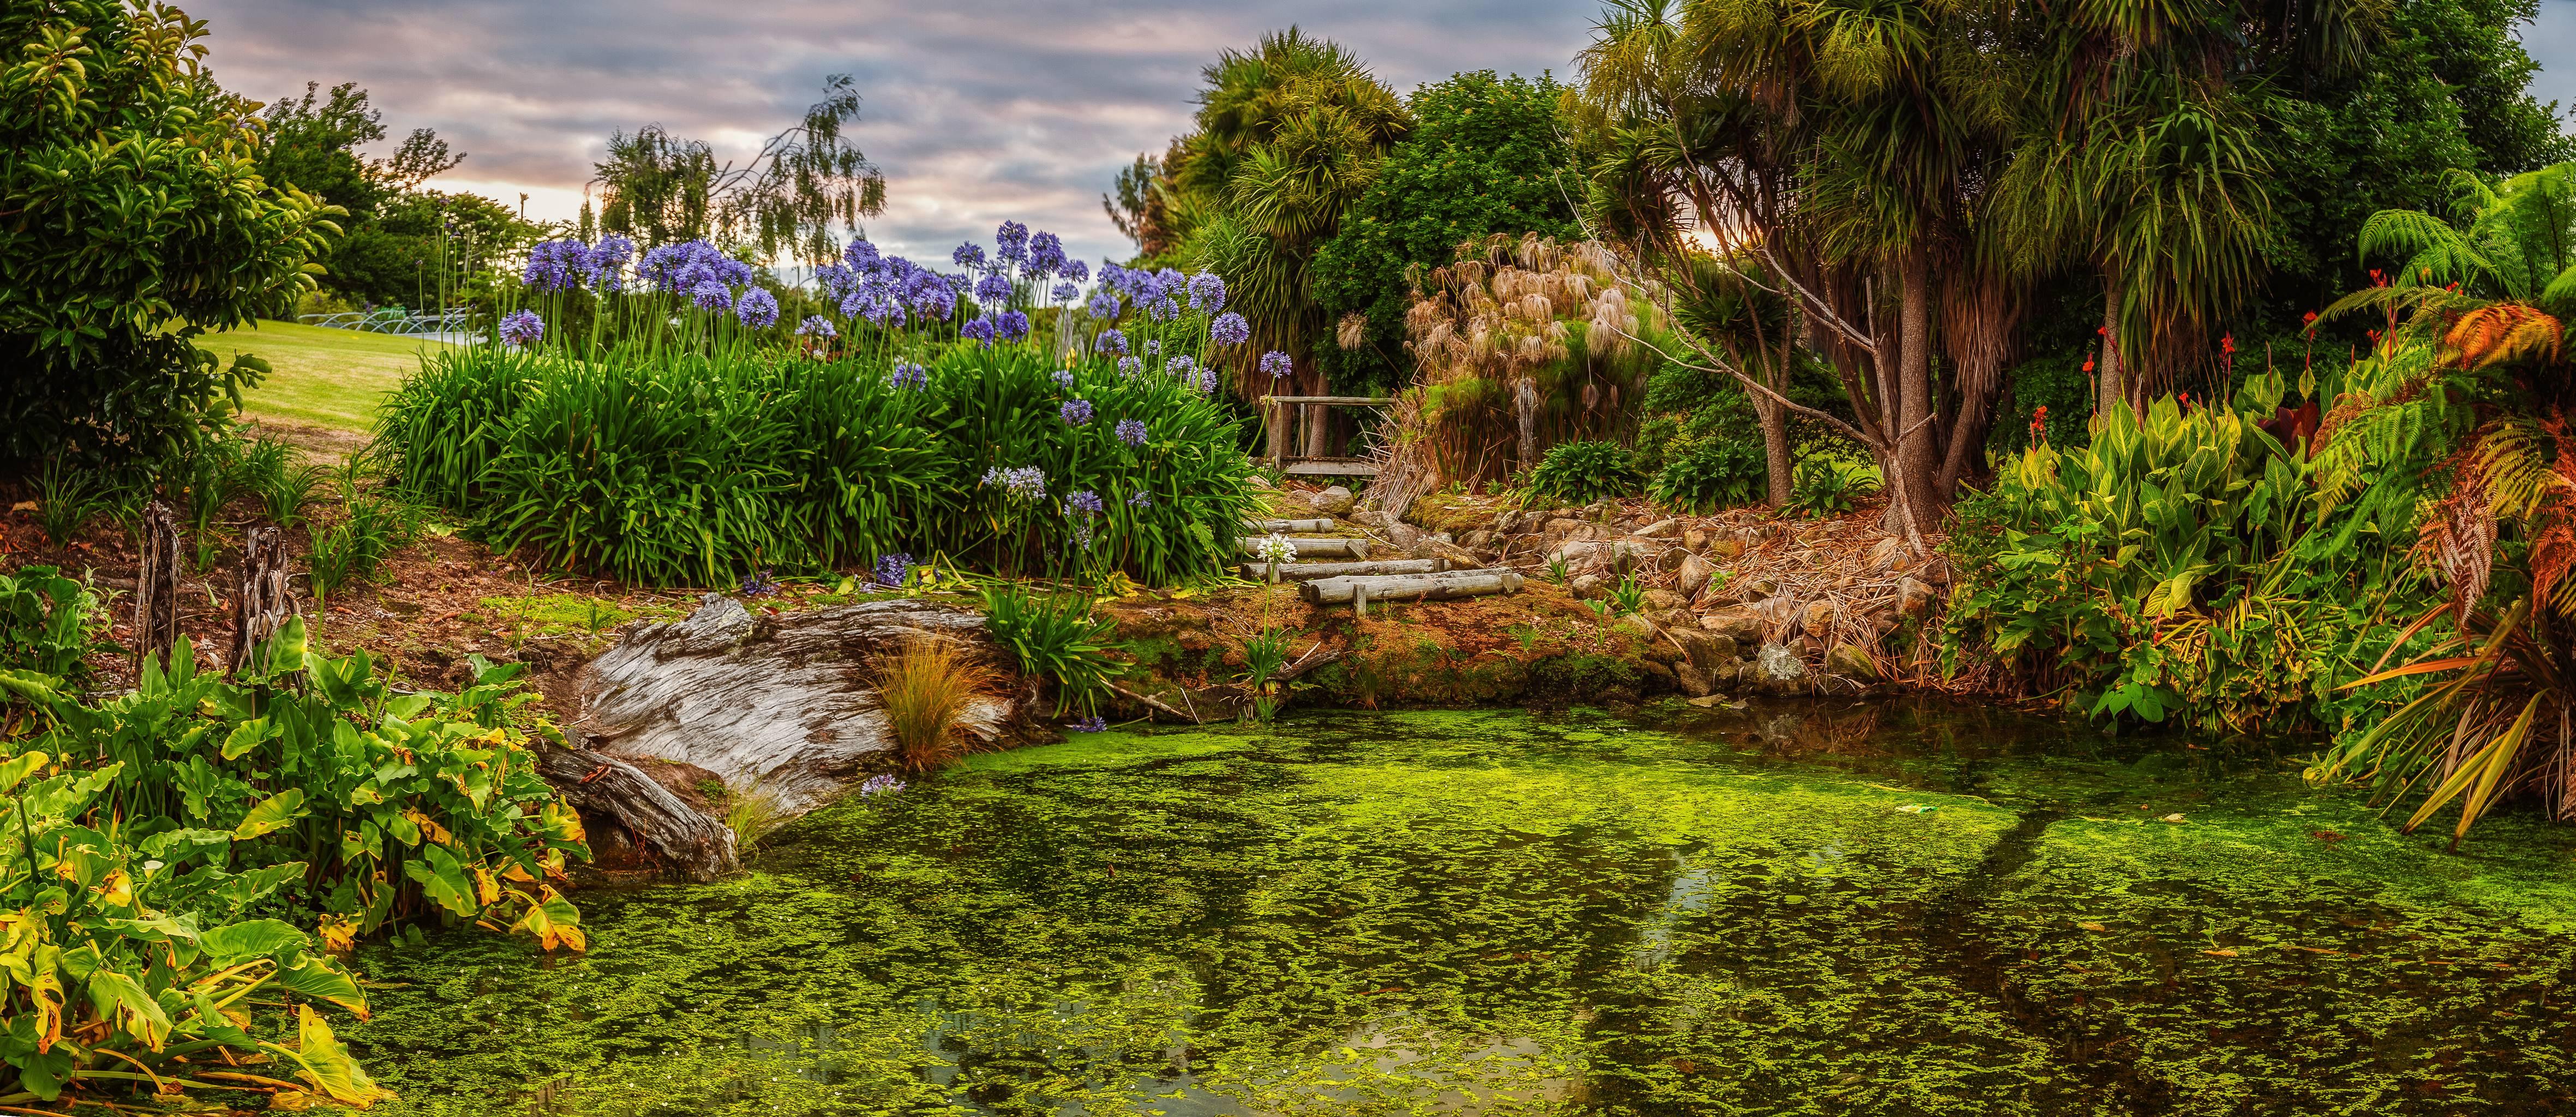 пруд, водоём, цветы